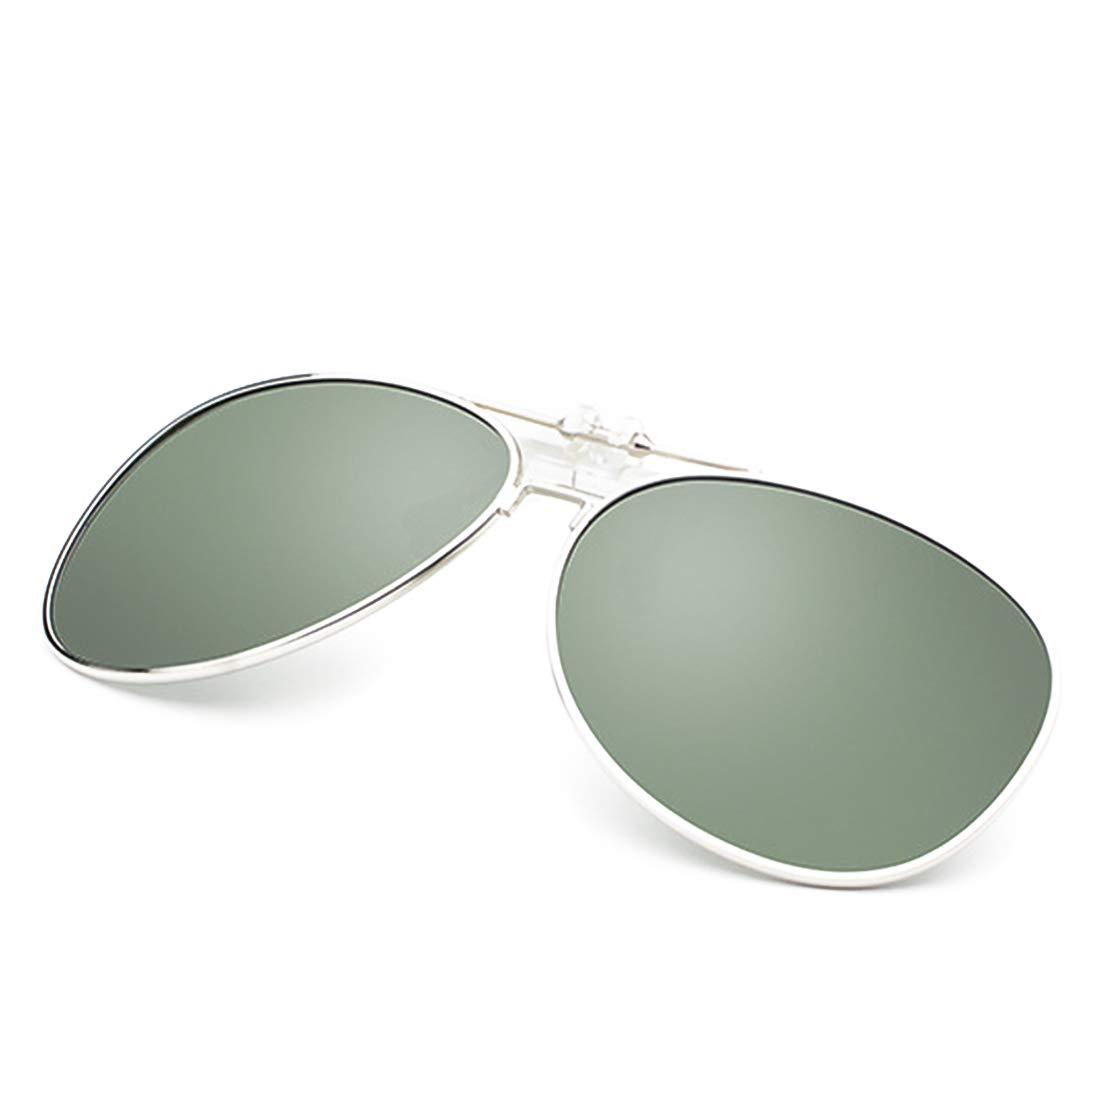 Dooppa Latest Design Unisex Clip-on Flip-up Polarized Sunglasses - Various Colors